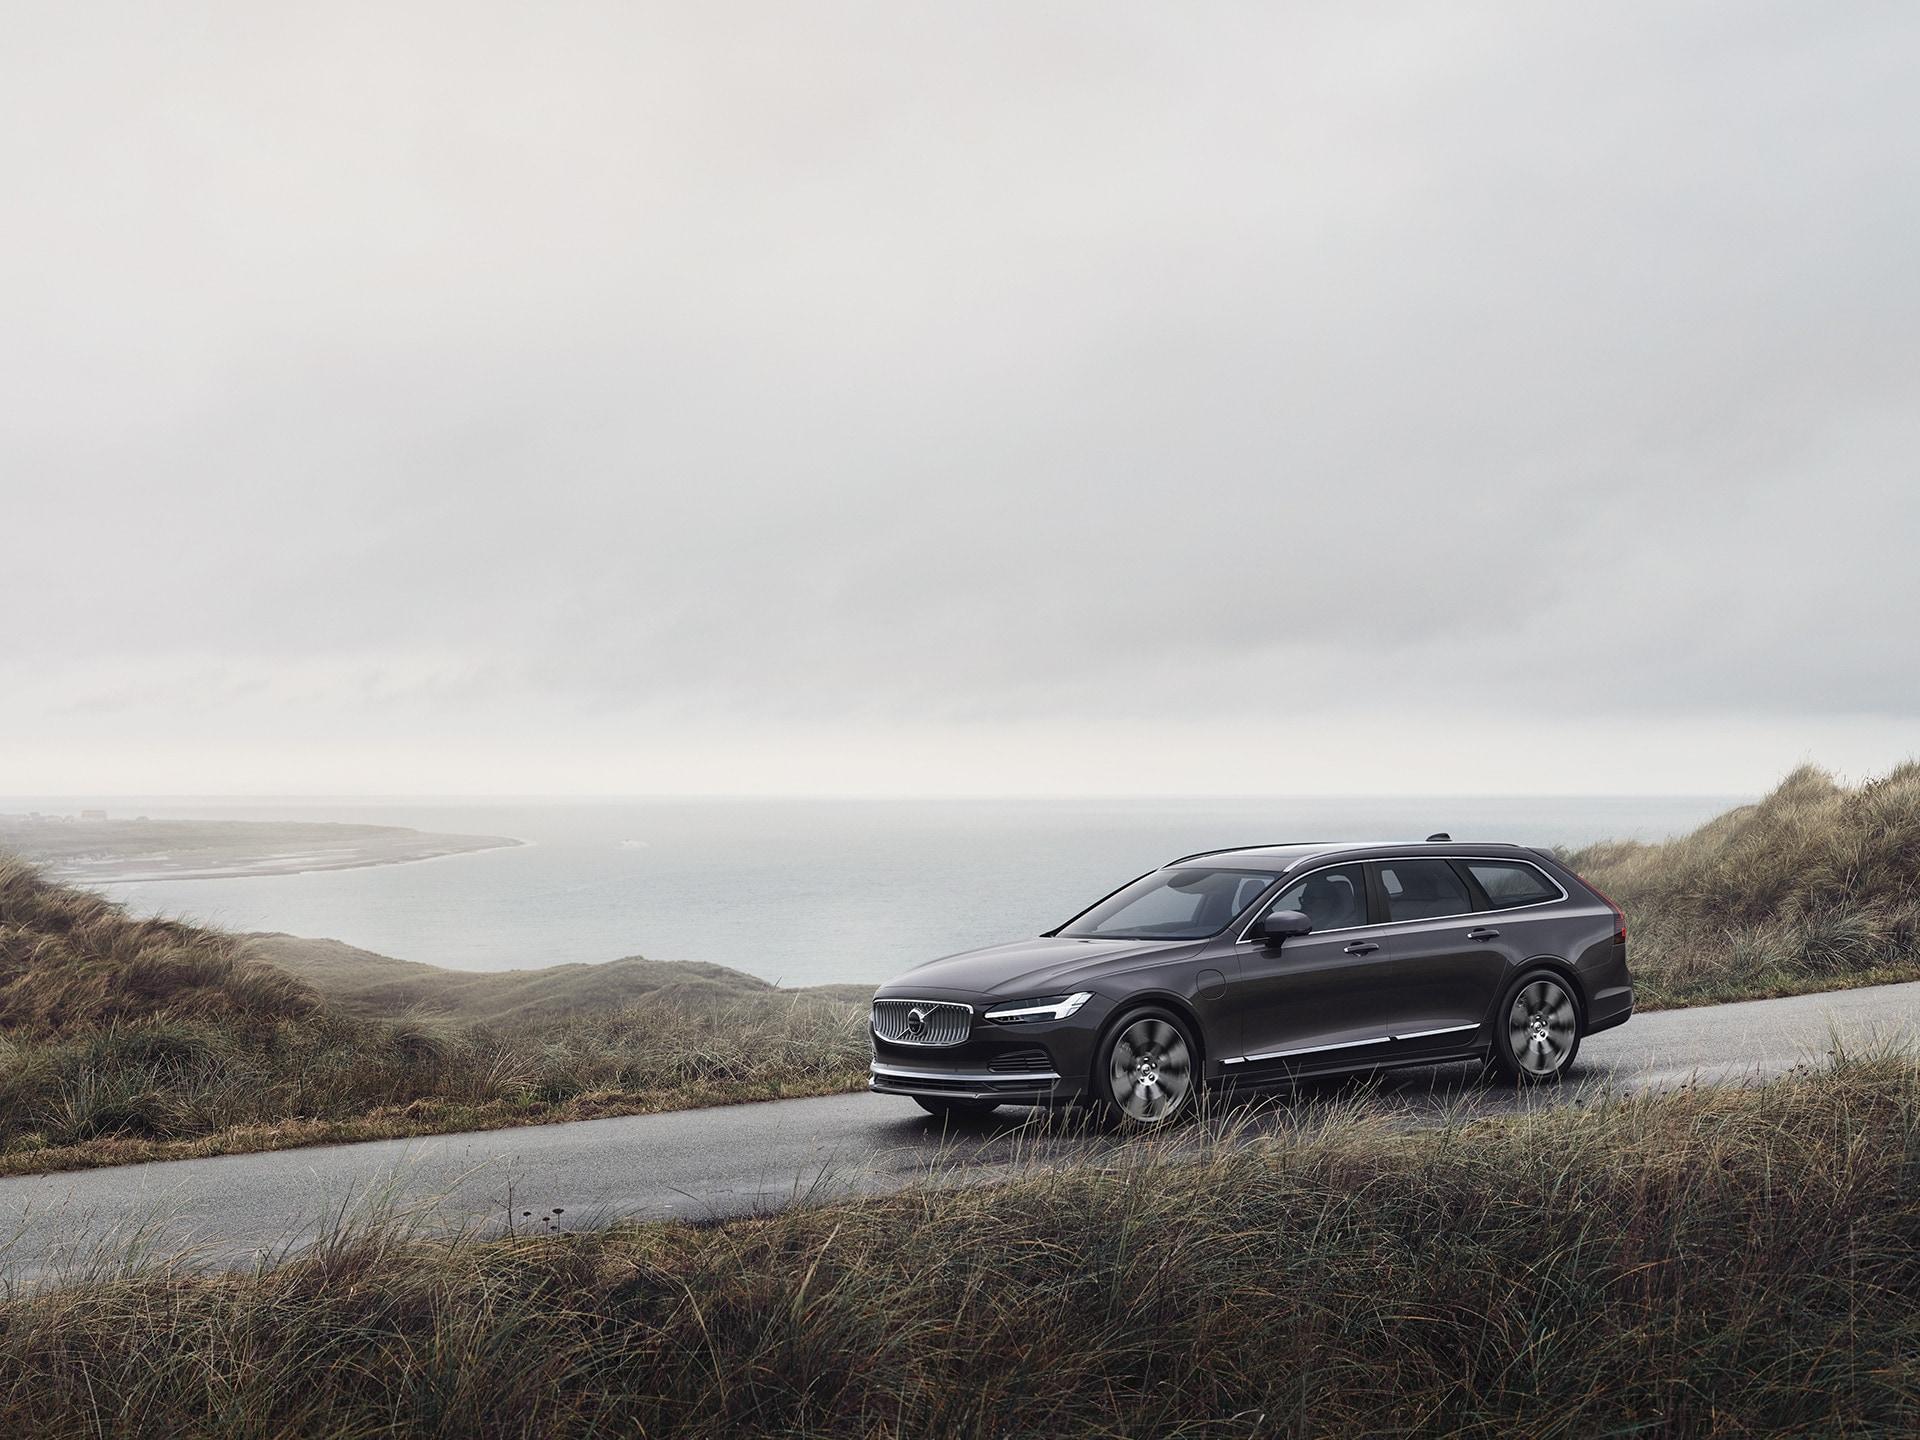 A Volvo V90 mild hybrid driving on a coastal road.